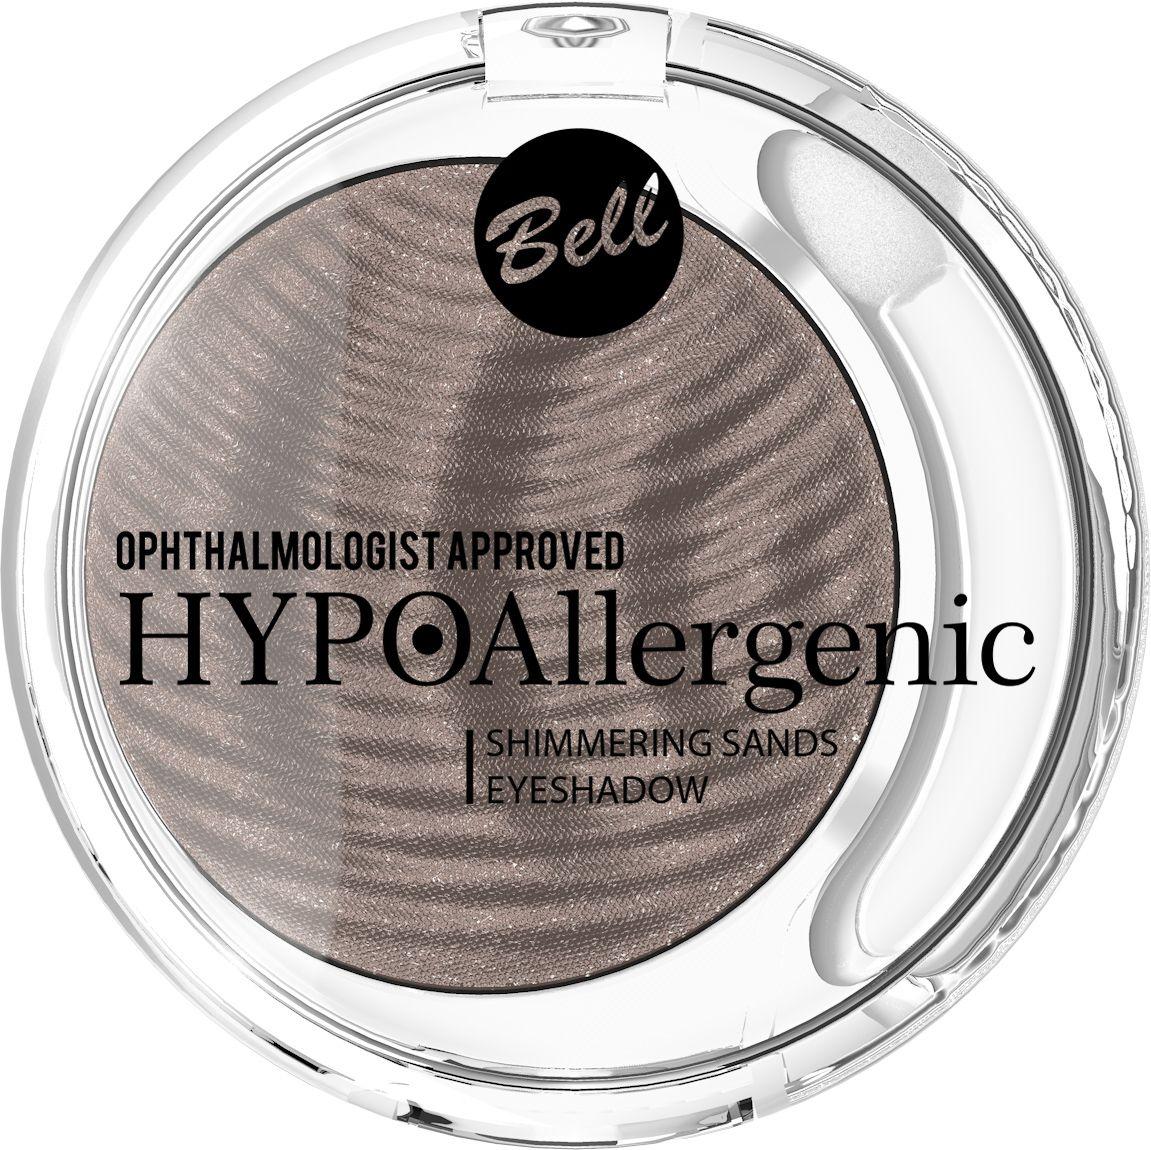 Bell Hypoallergenic Кремовые тени для век Shimmering Sands Eyeshadow, Тон №06BcssHA006